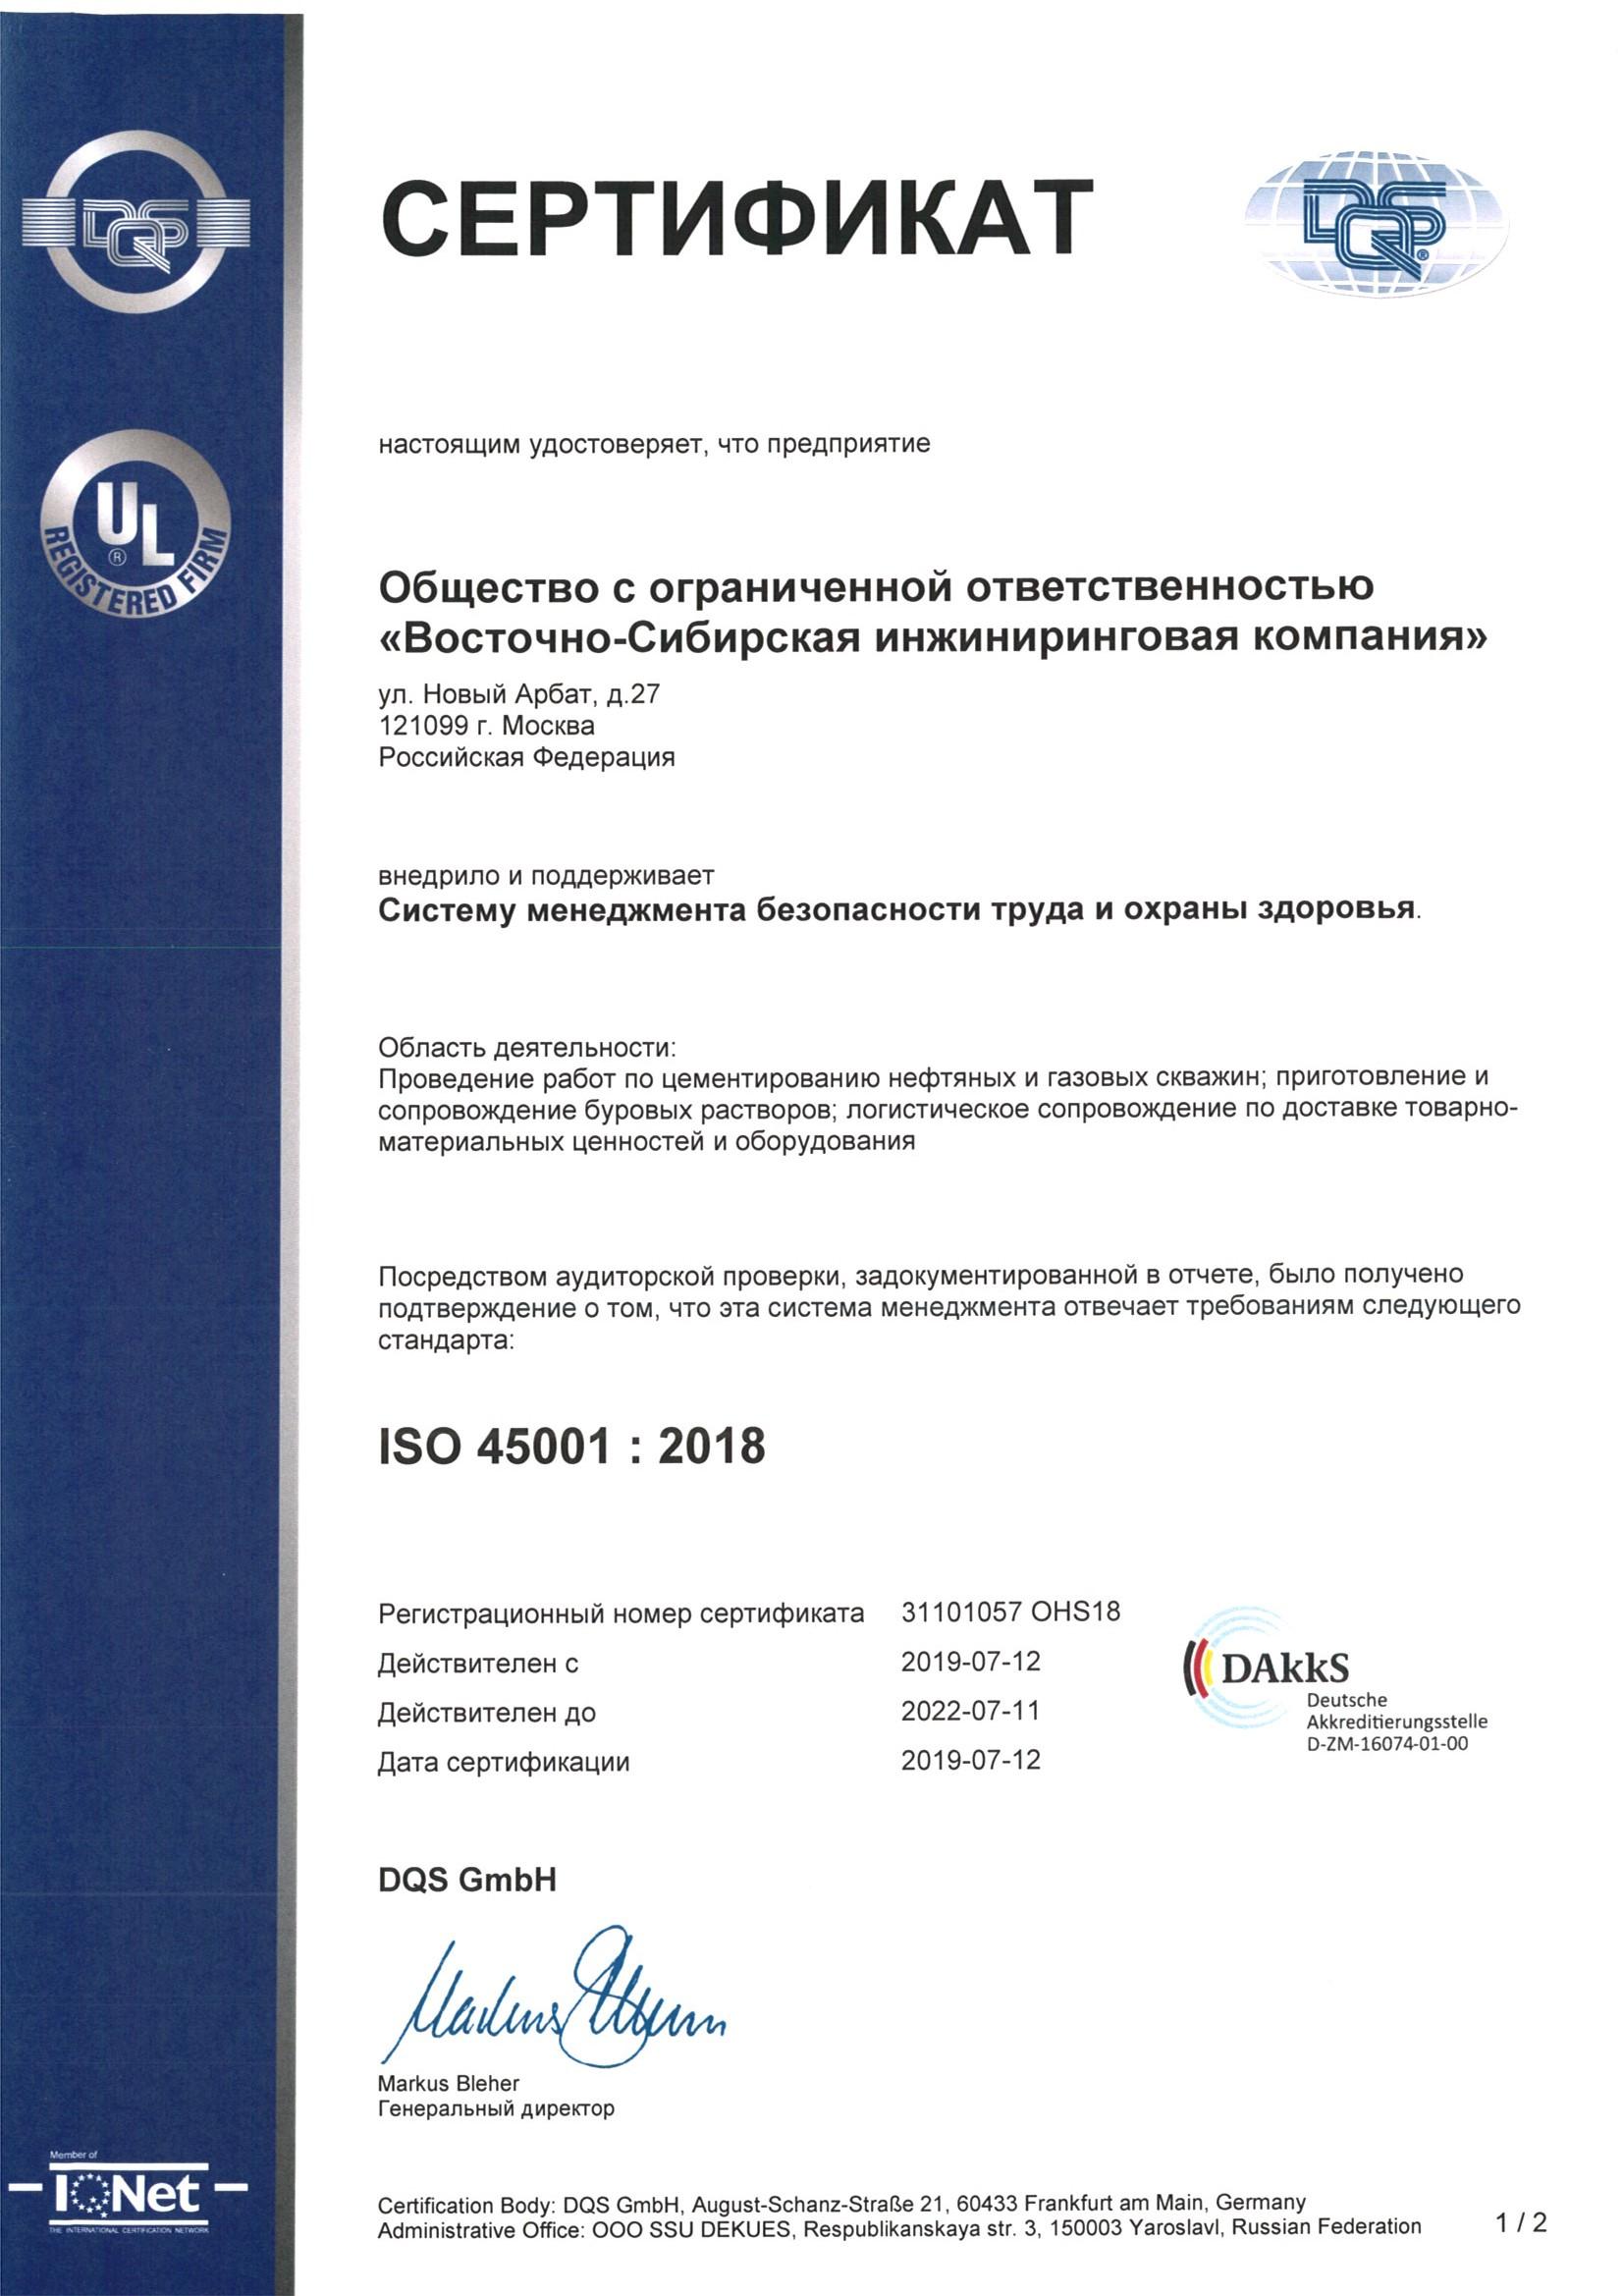 sertifikat-iso-45001-2018